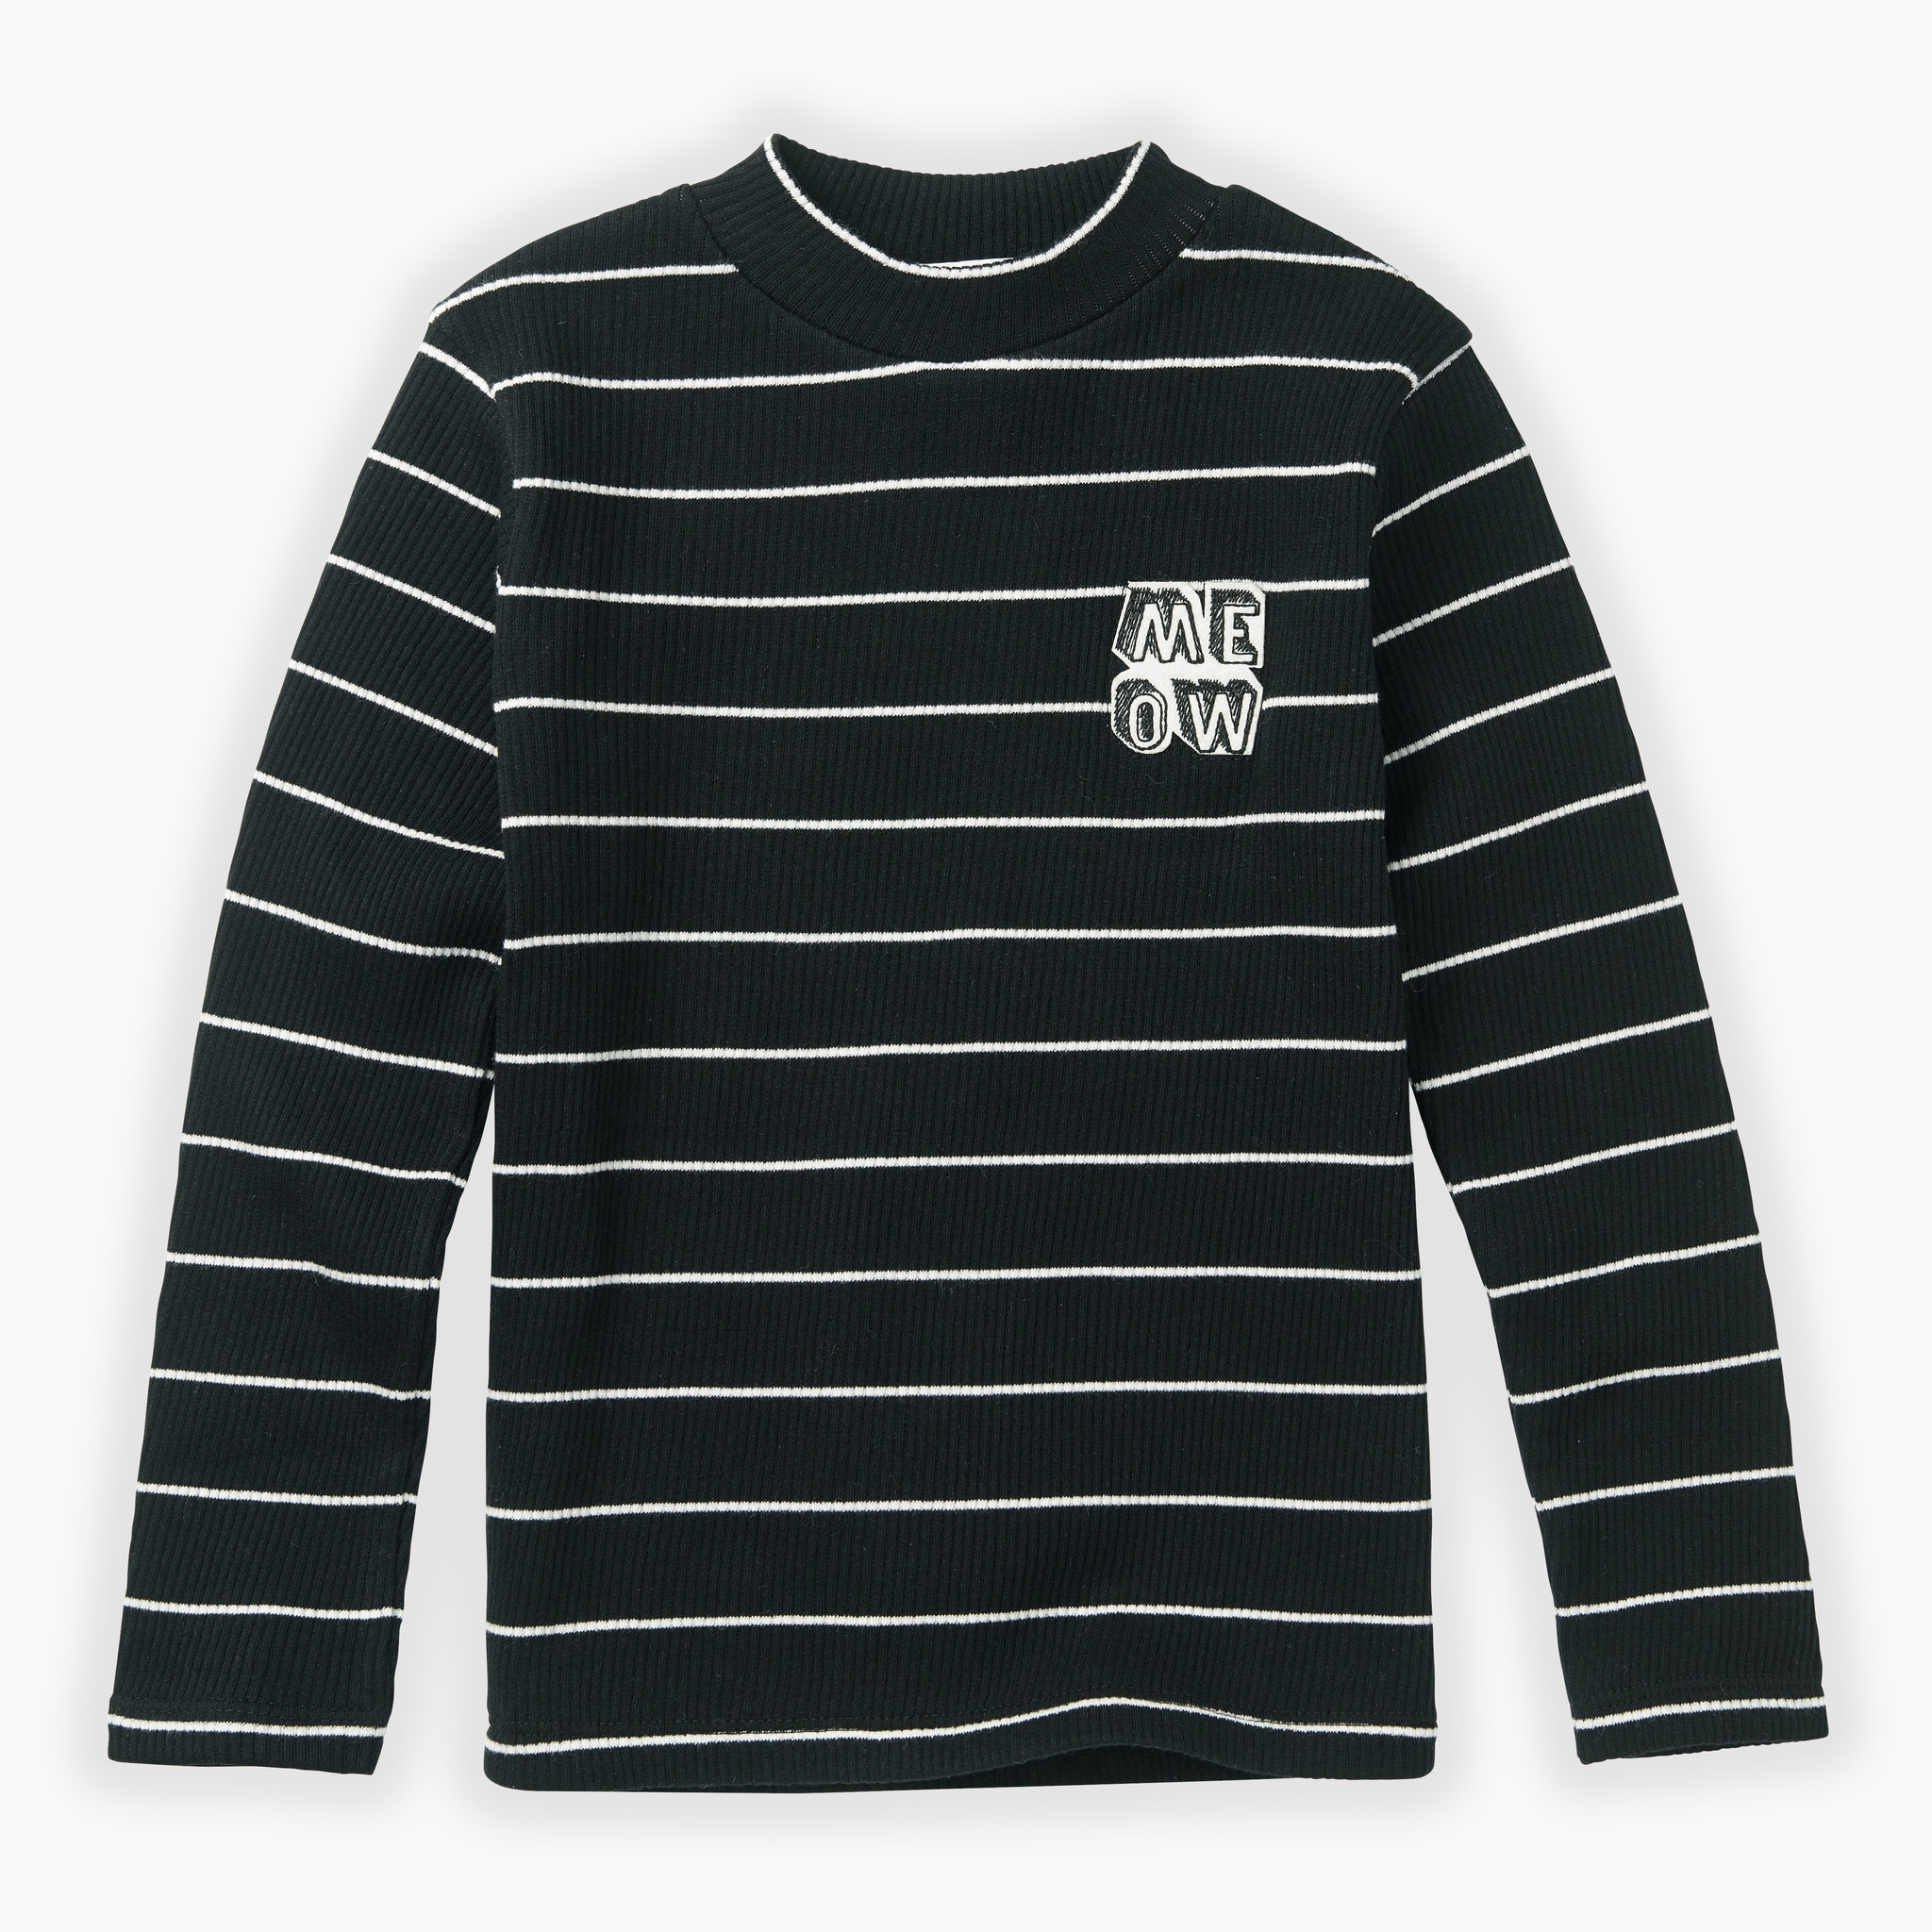 Sproet & Sprout Turtle neck t-shirt stripe | black